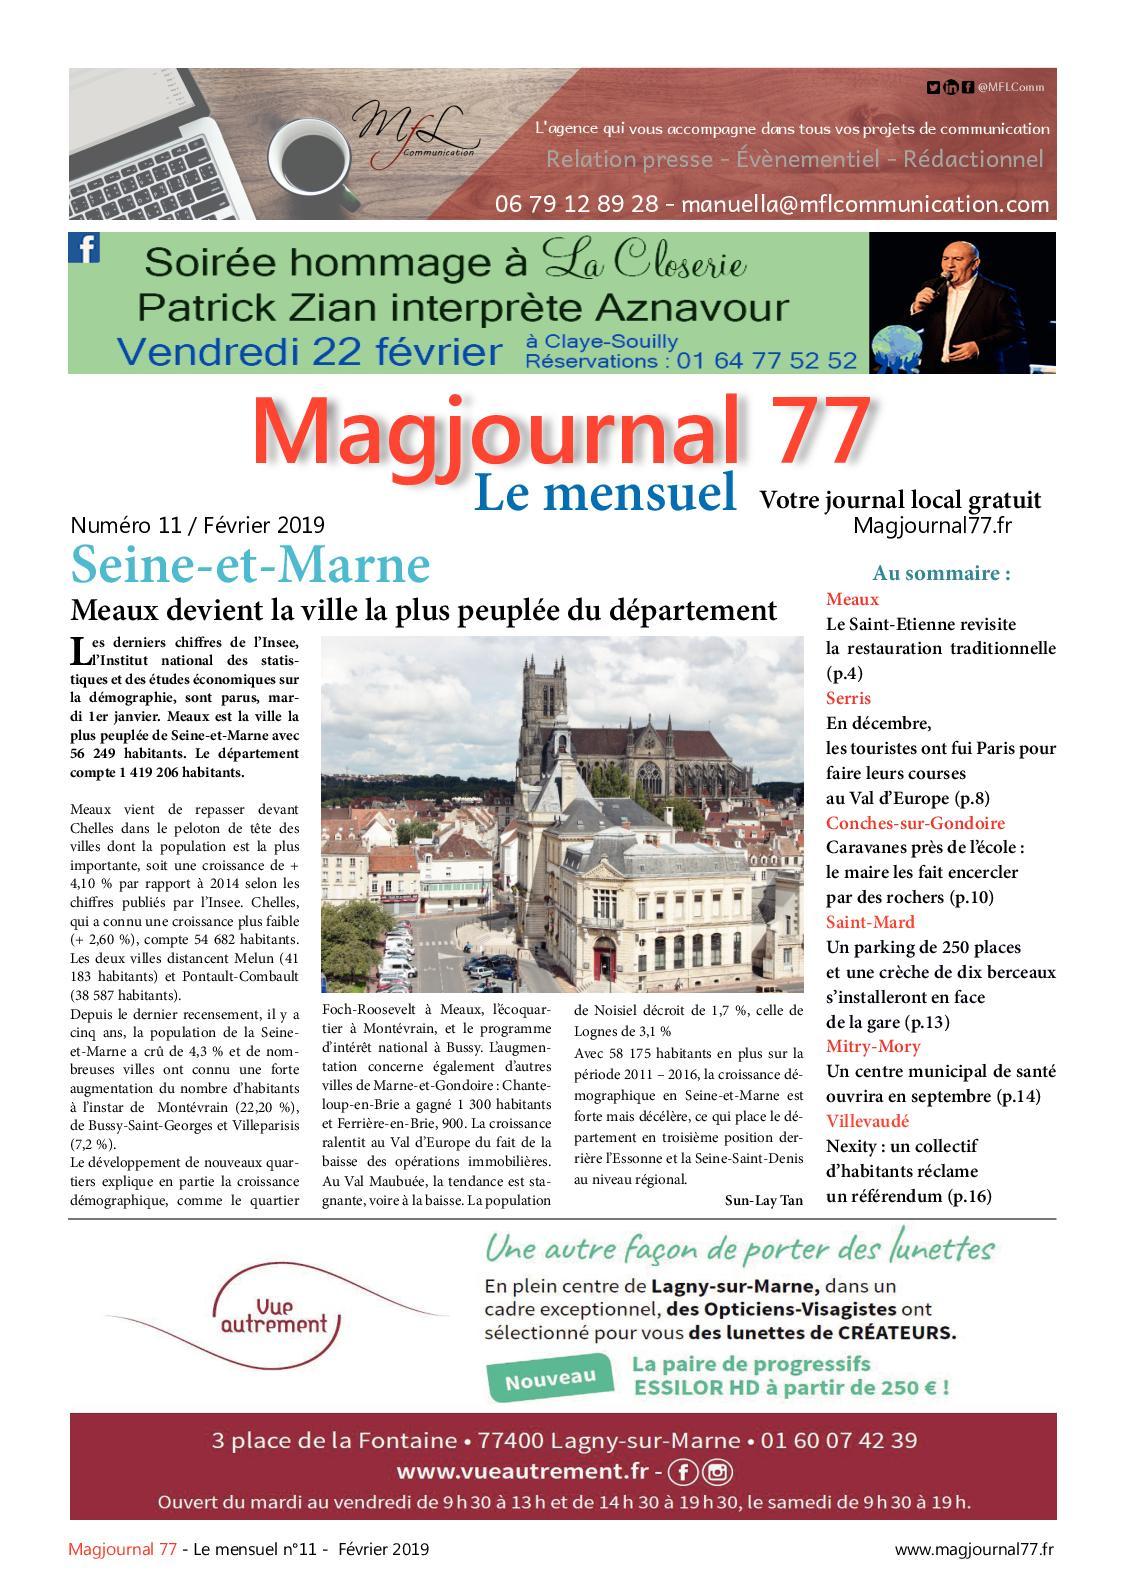 93e79b04600c Calaméo - Magjournal 77 - Le Mensuel N° 11 - Février 2019